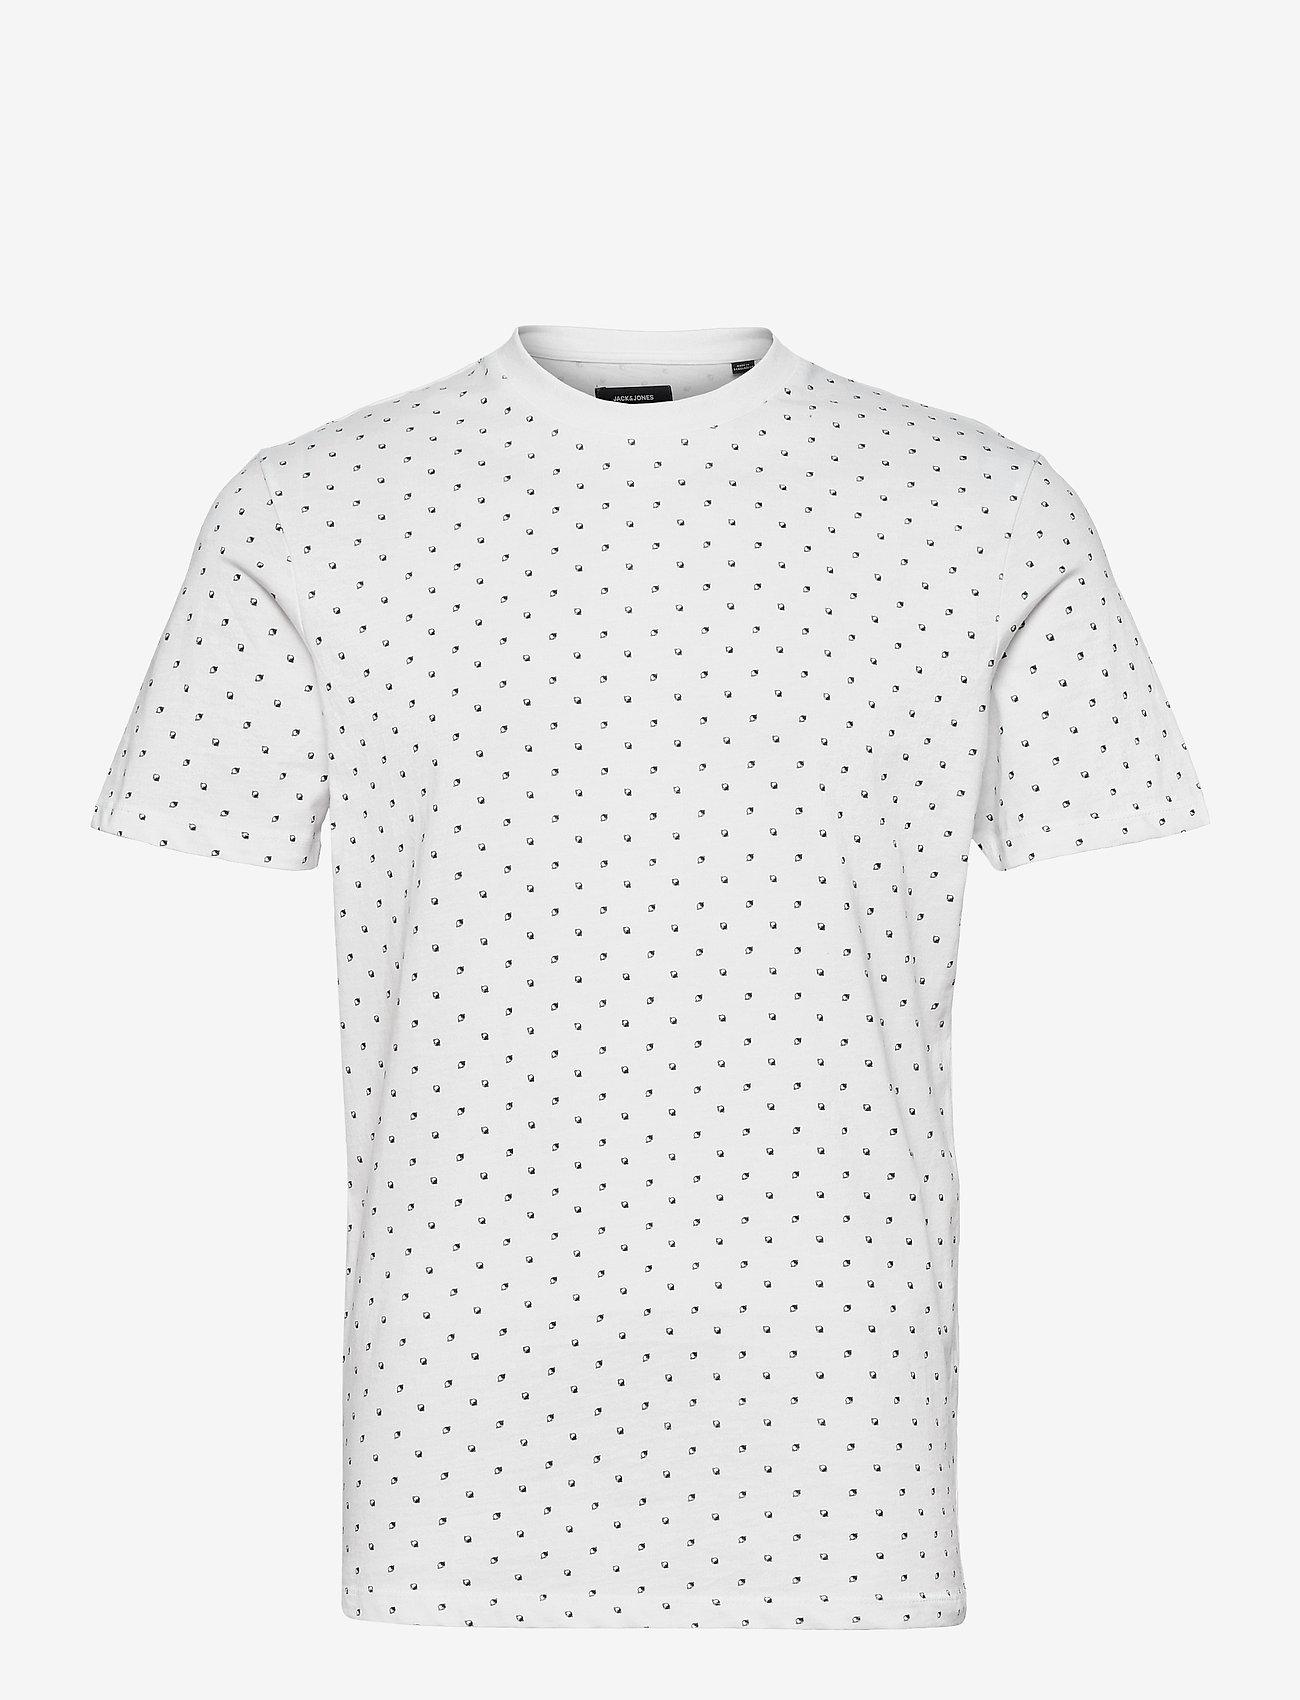 Jack & Jones - JJMINIMAL AOP TEE SS CREW NECK - kortärmade t-shirts - white - 0